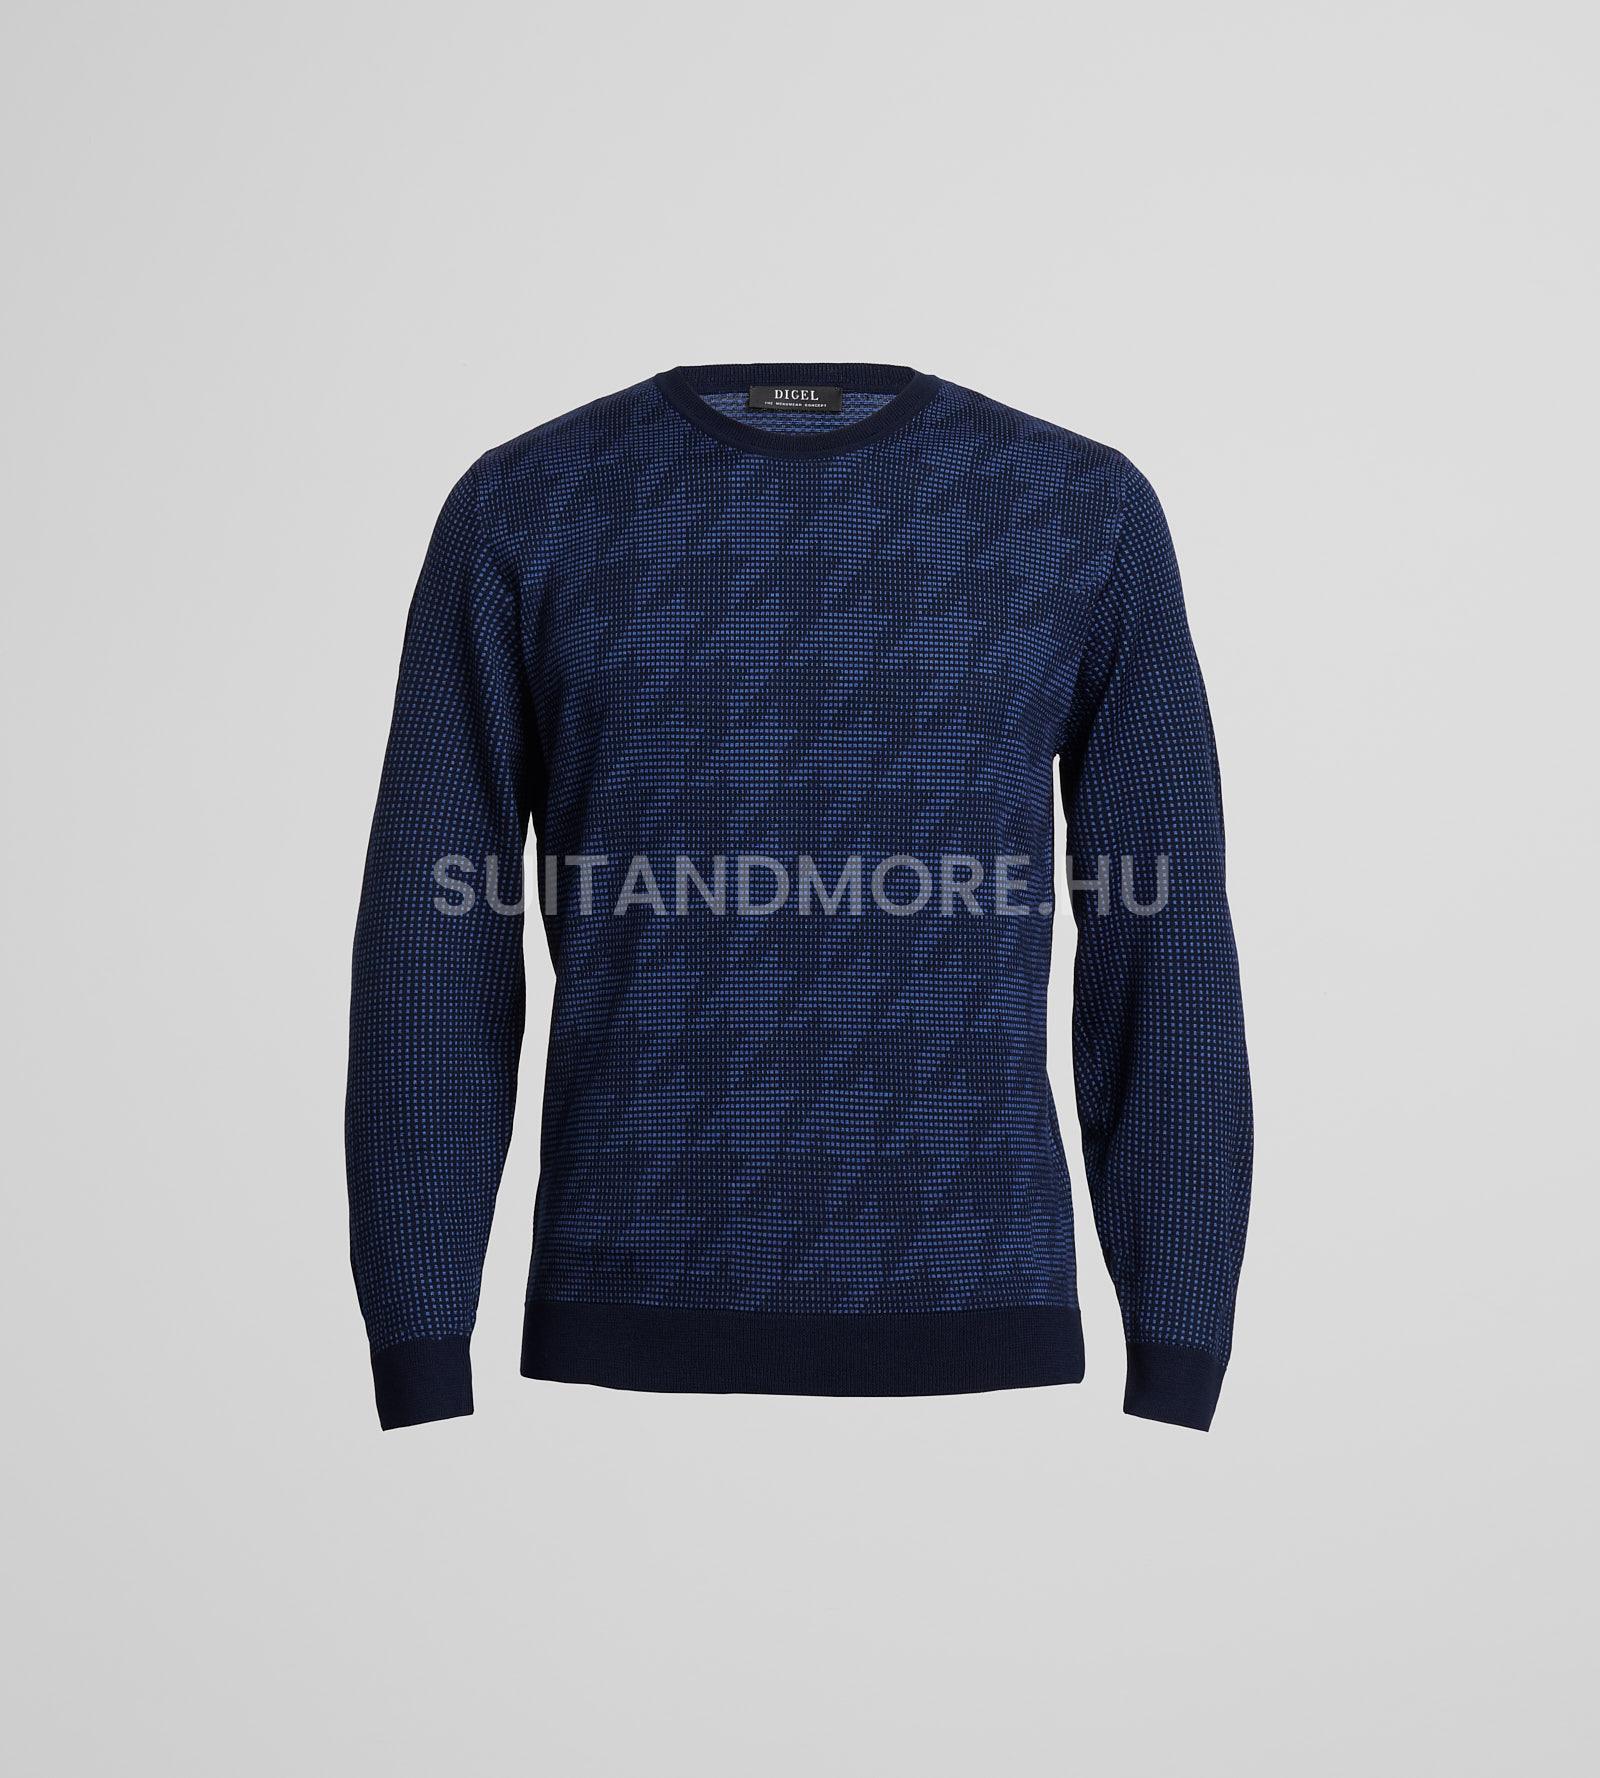 digel-sotetkek-modern-fit-kerek-nyaku-tyuklabmintas-gyapju-pulover-faros1-1-1288010-20-01